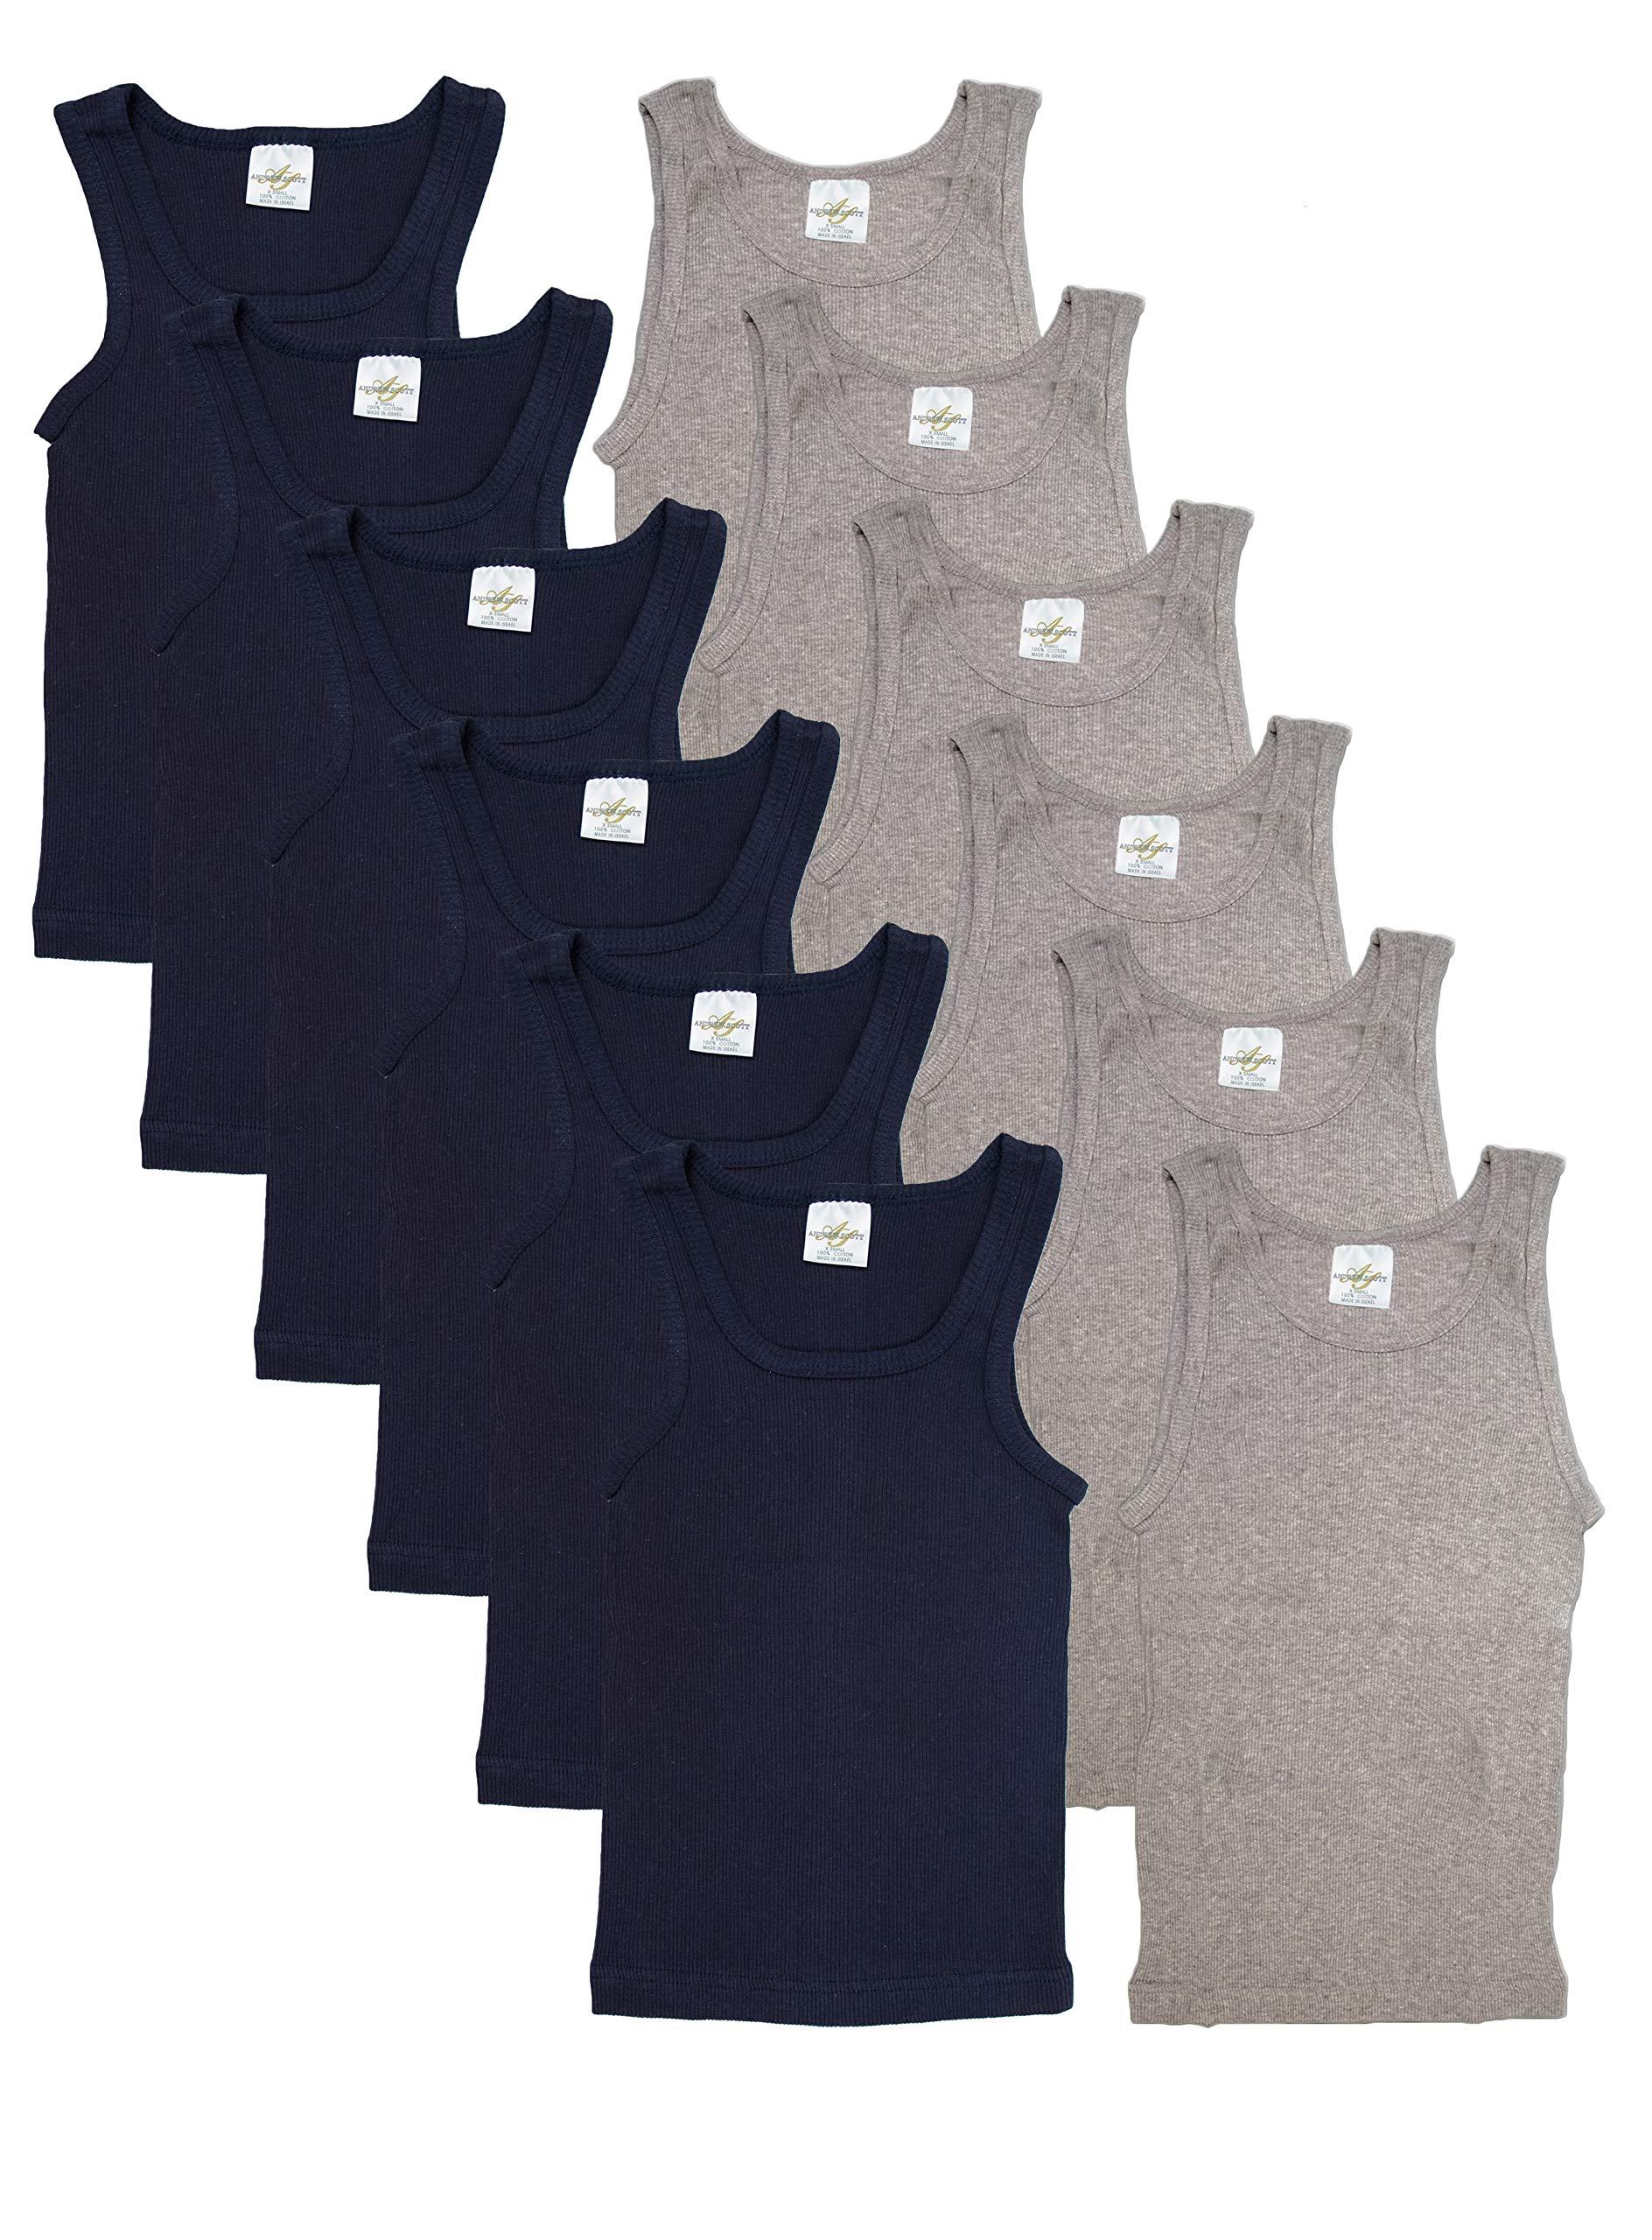 Andrew Scott Basics Boys 12 Pack Color A - Shirt Tank Top Undershirts (Small / (6-8), 12 PK- Grey/Navy)